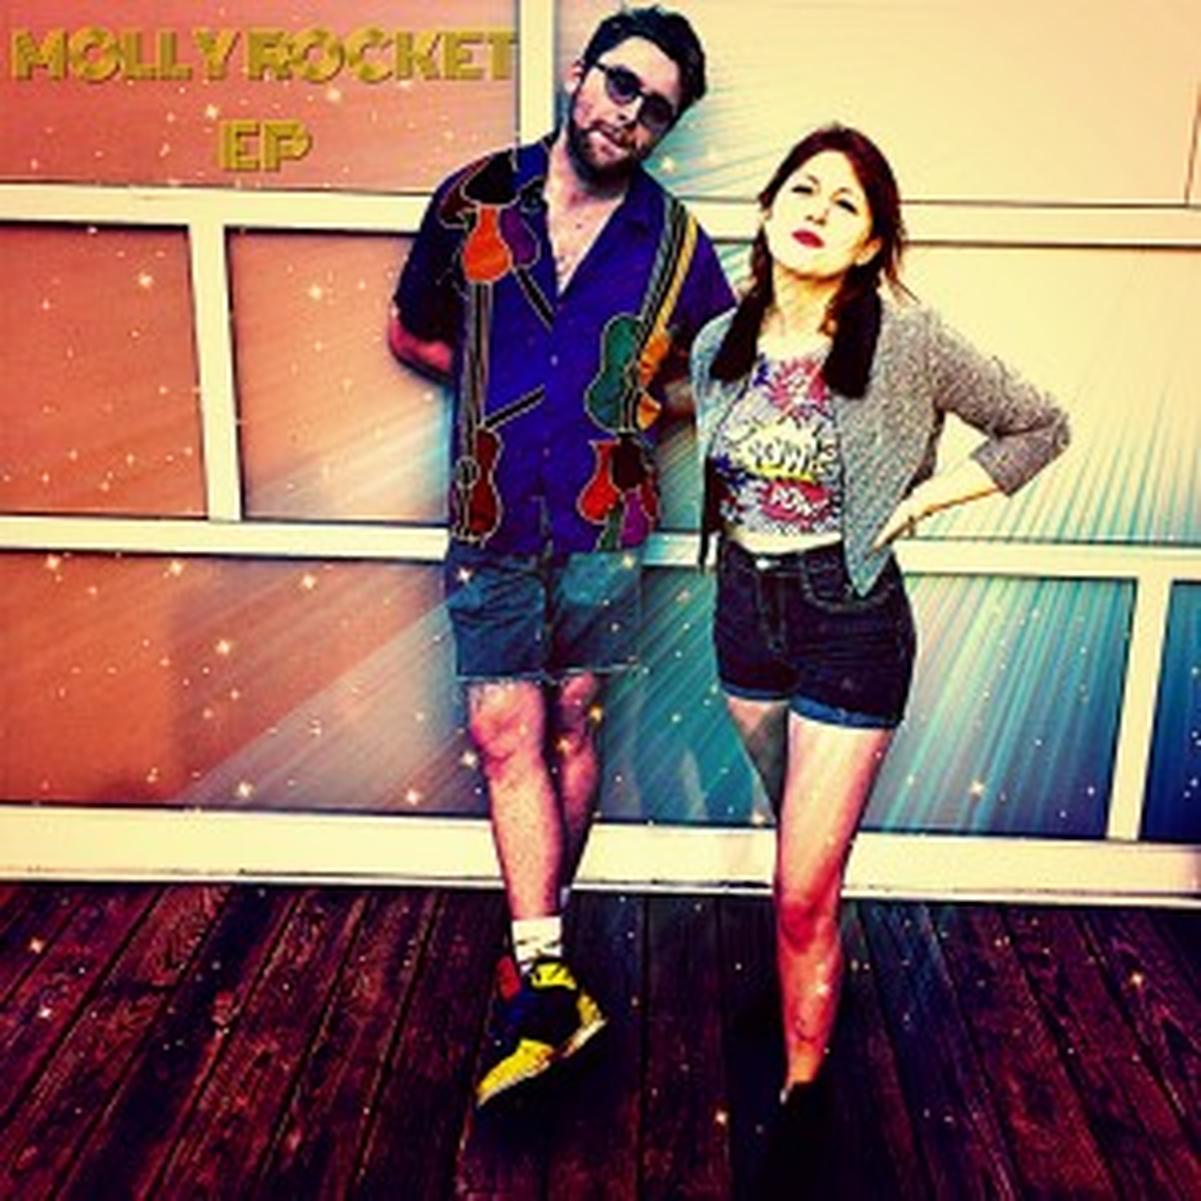 Molly Rocket